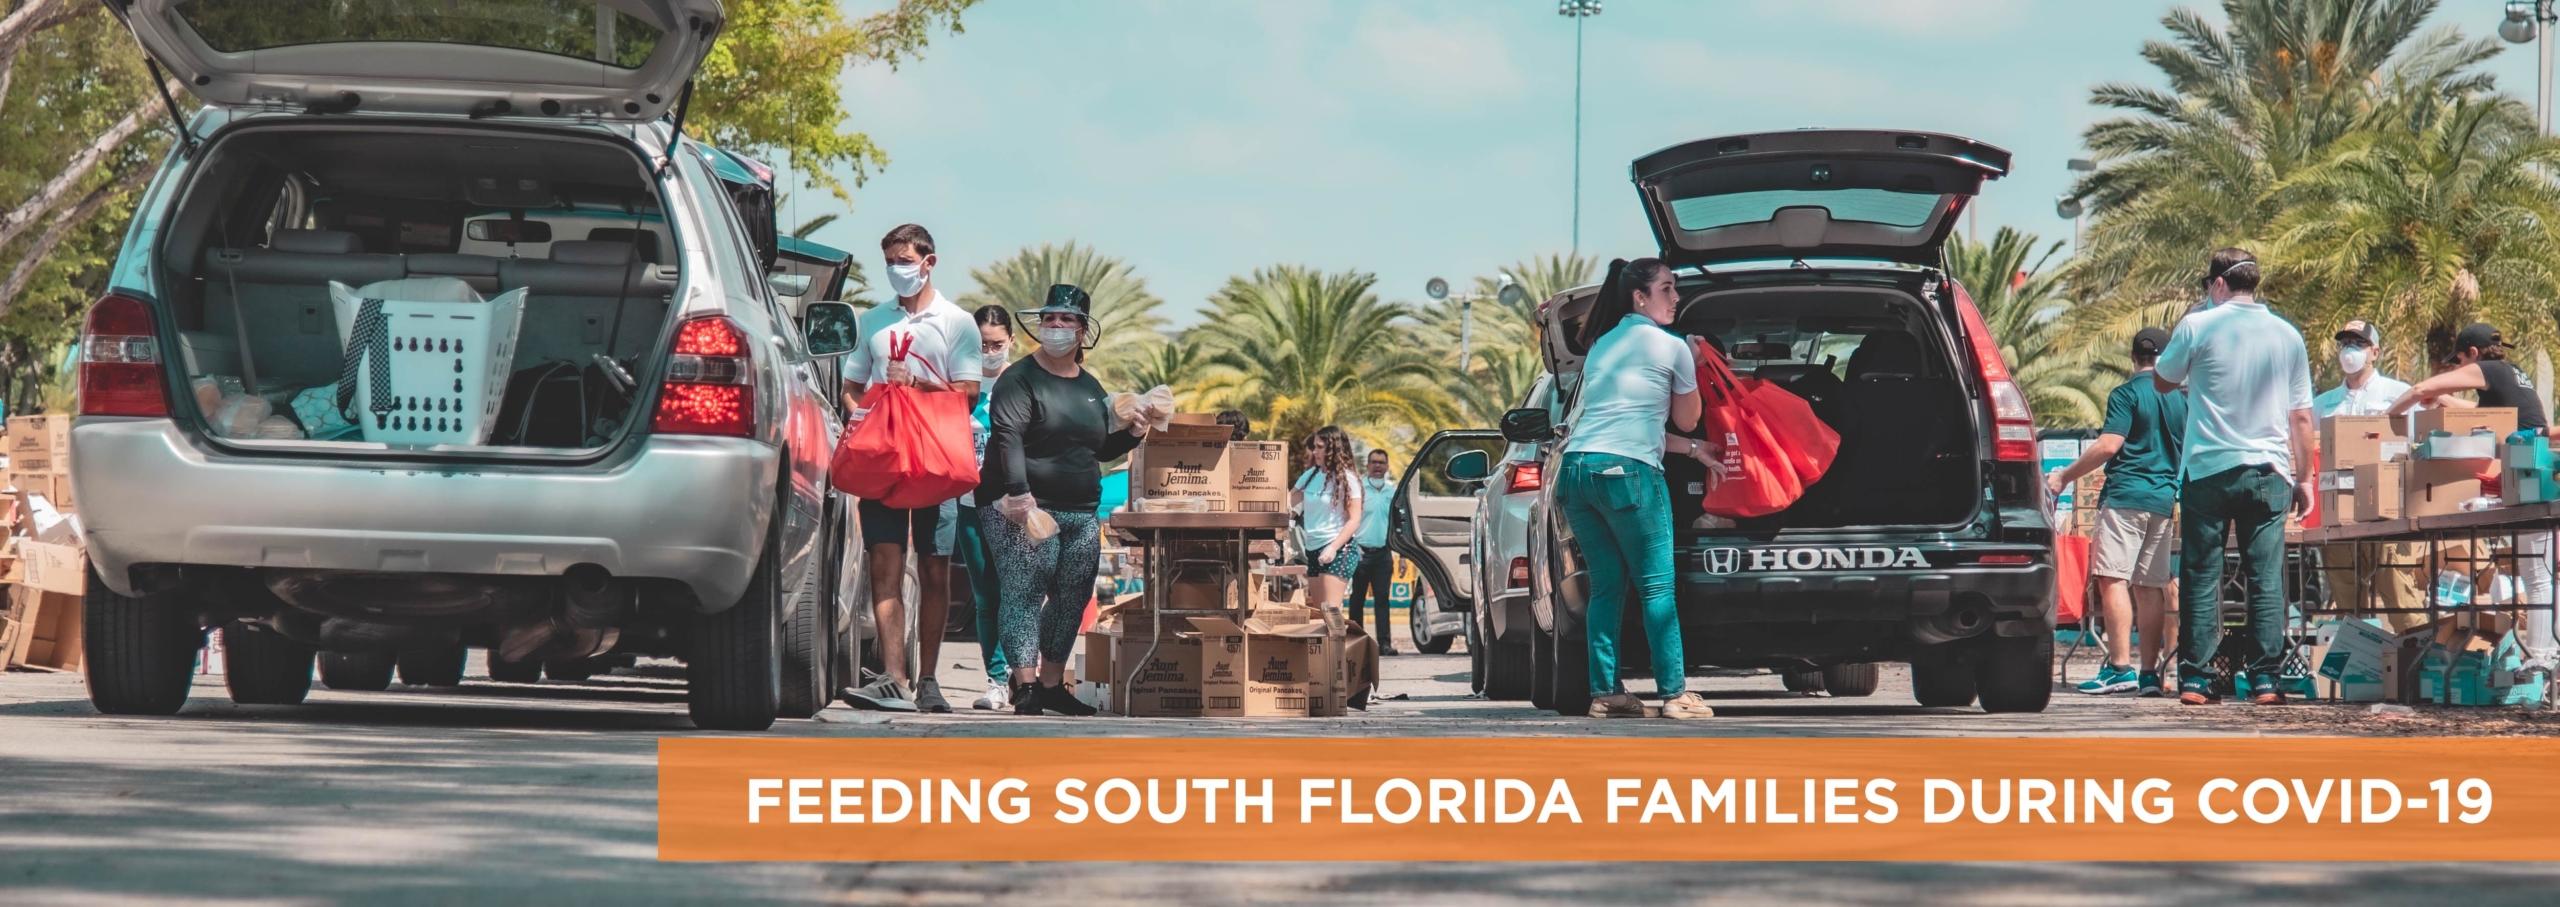 Feeding South Florida's COVID-19 Response Update